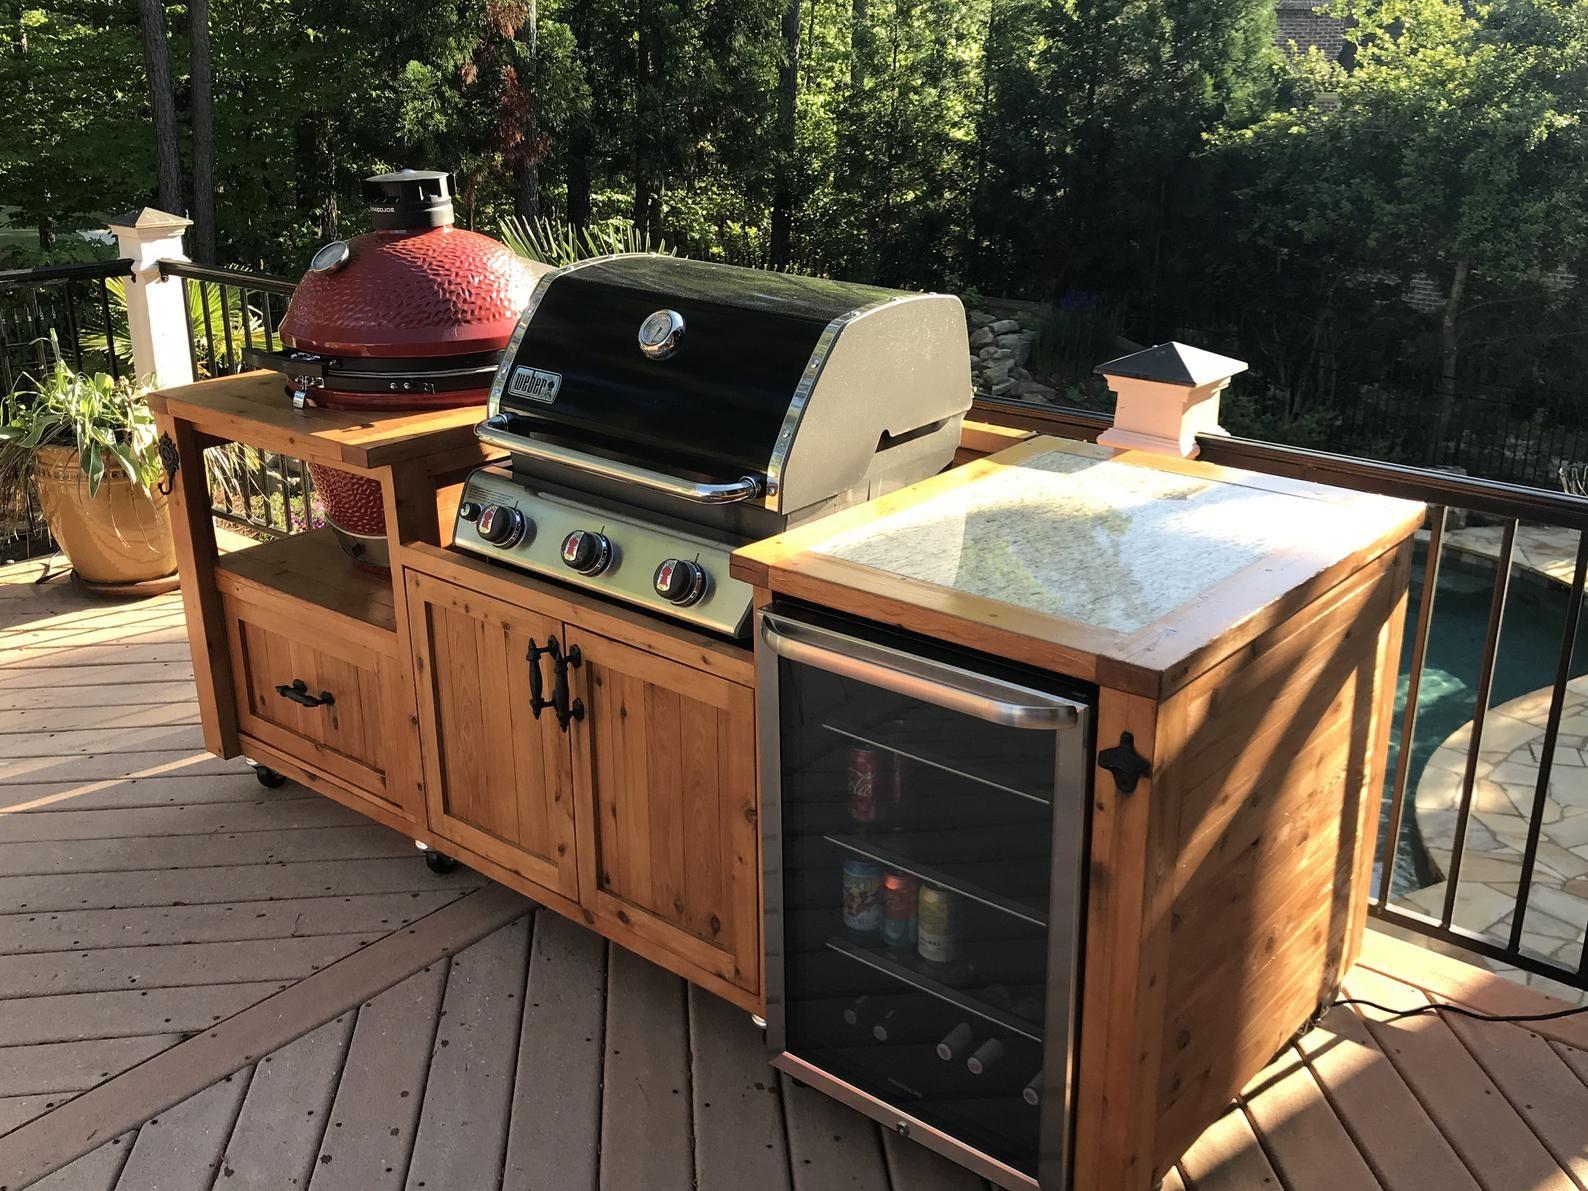 Outdoor Grill Kitchen Grill Cabinet Grill Table And Other Outdoor Patio Furniture Mesa Parrilla Parrillas De Cocina Cocina Al Aire Libre